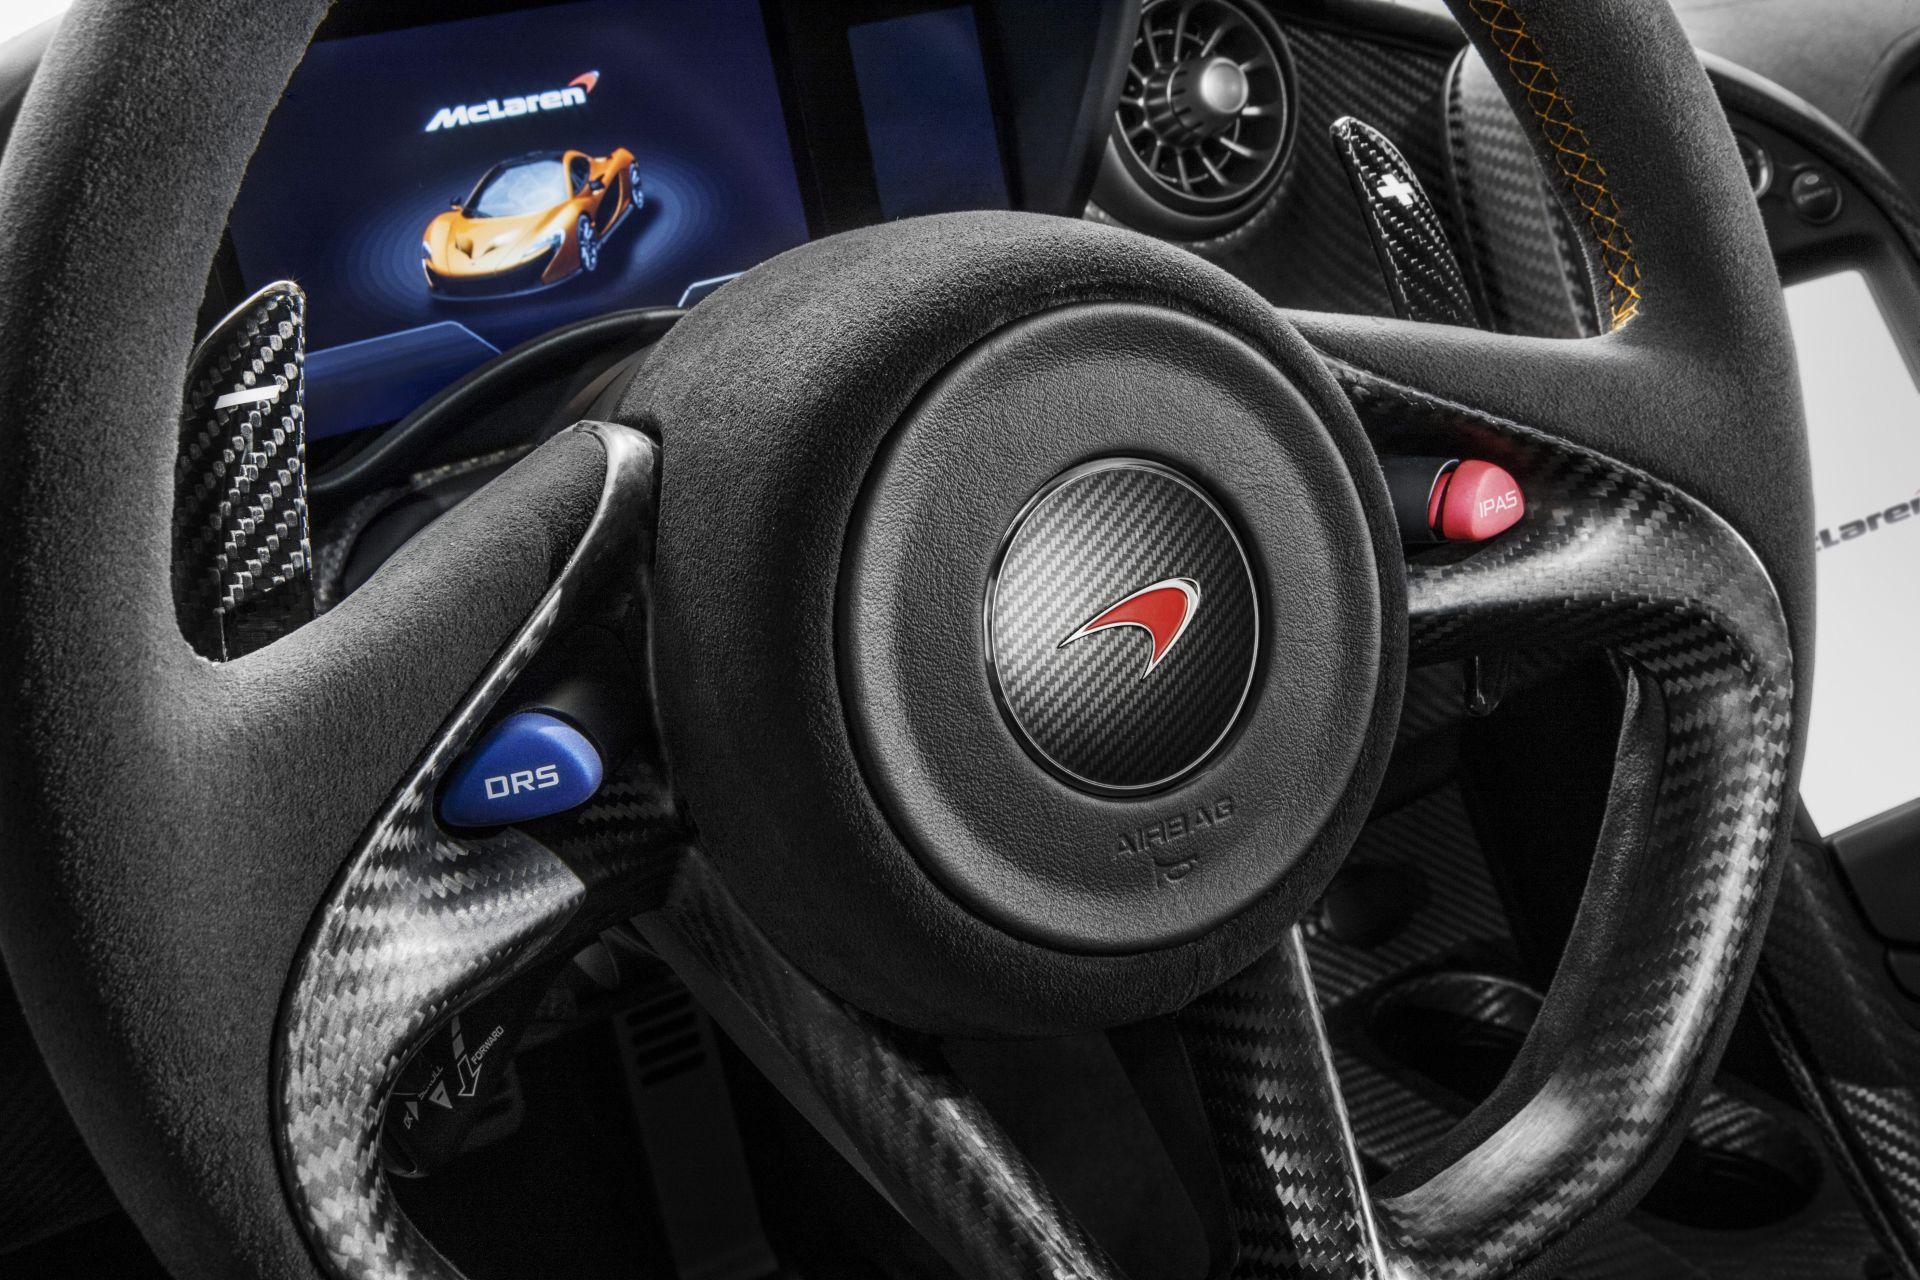 McLaren P1: 903 CV e 900 Nm, con emissioni inferiori a 200 g/km